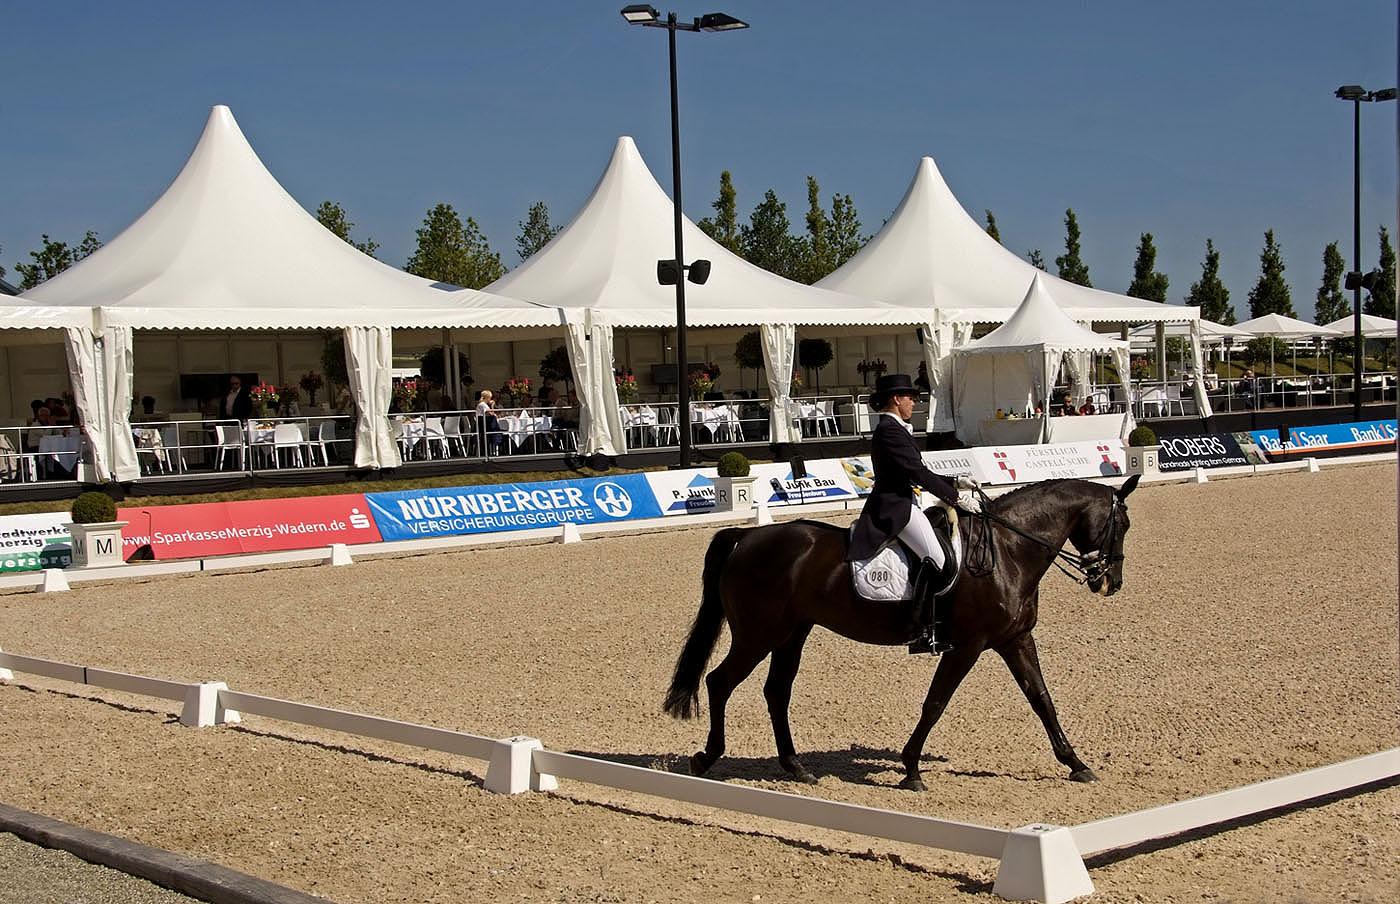 Großen Pferdesport, ....